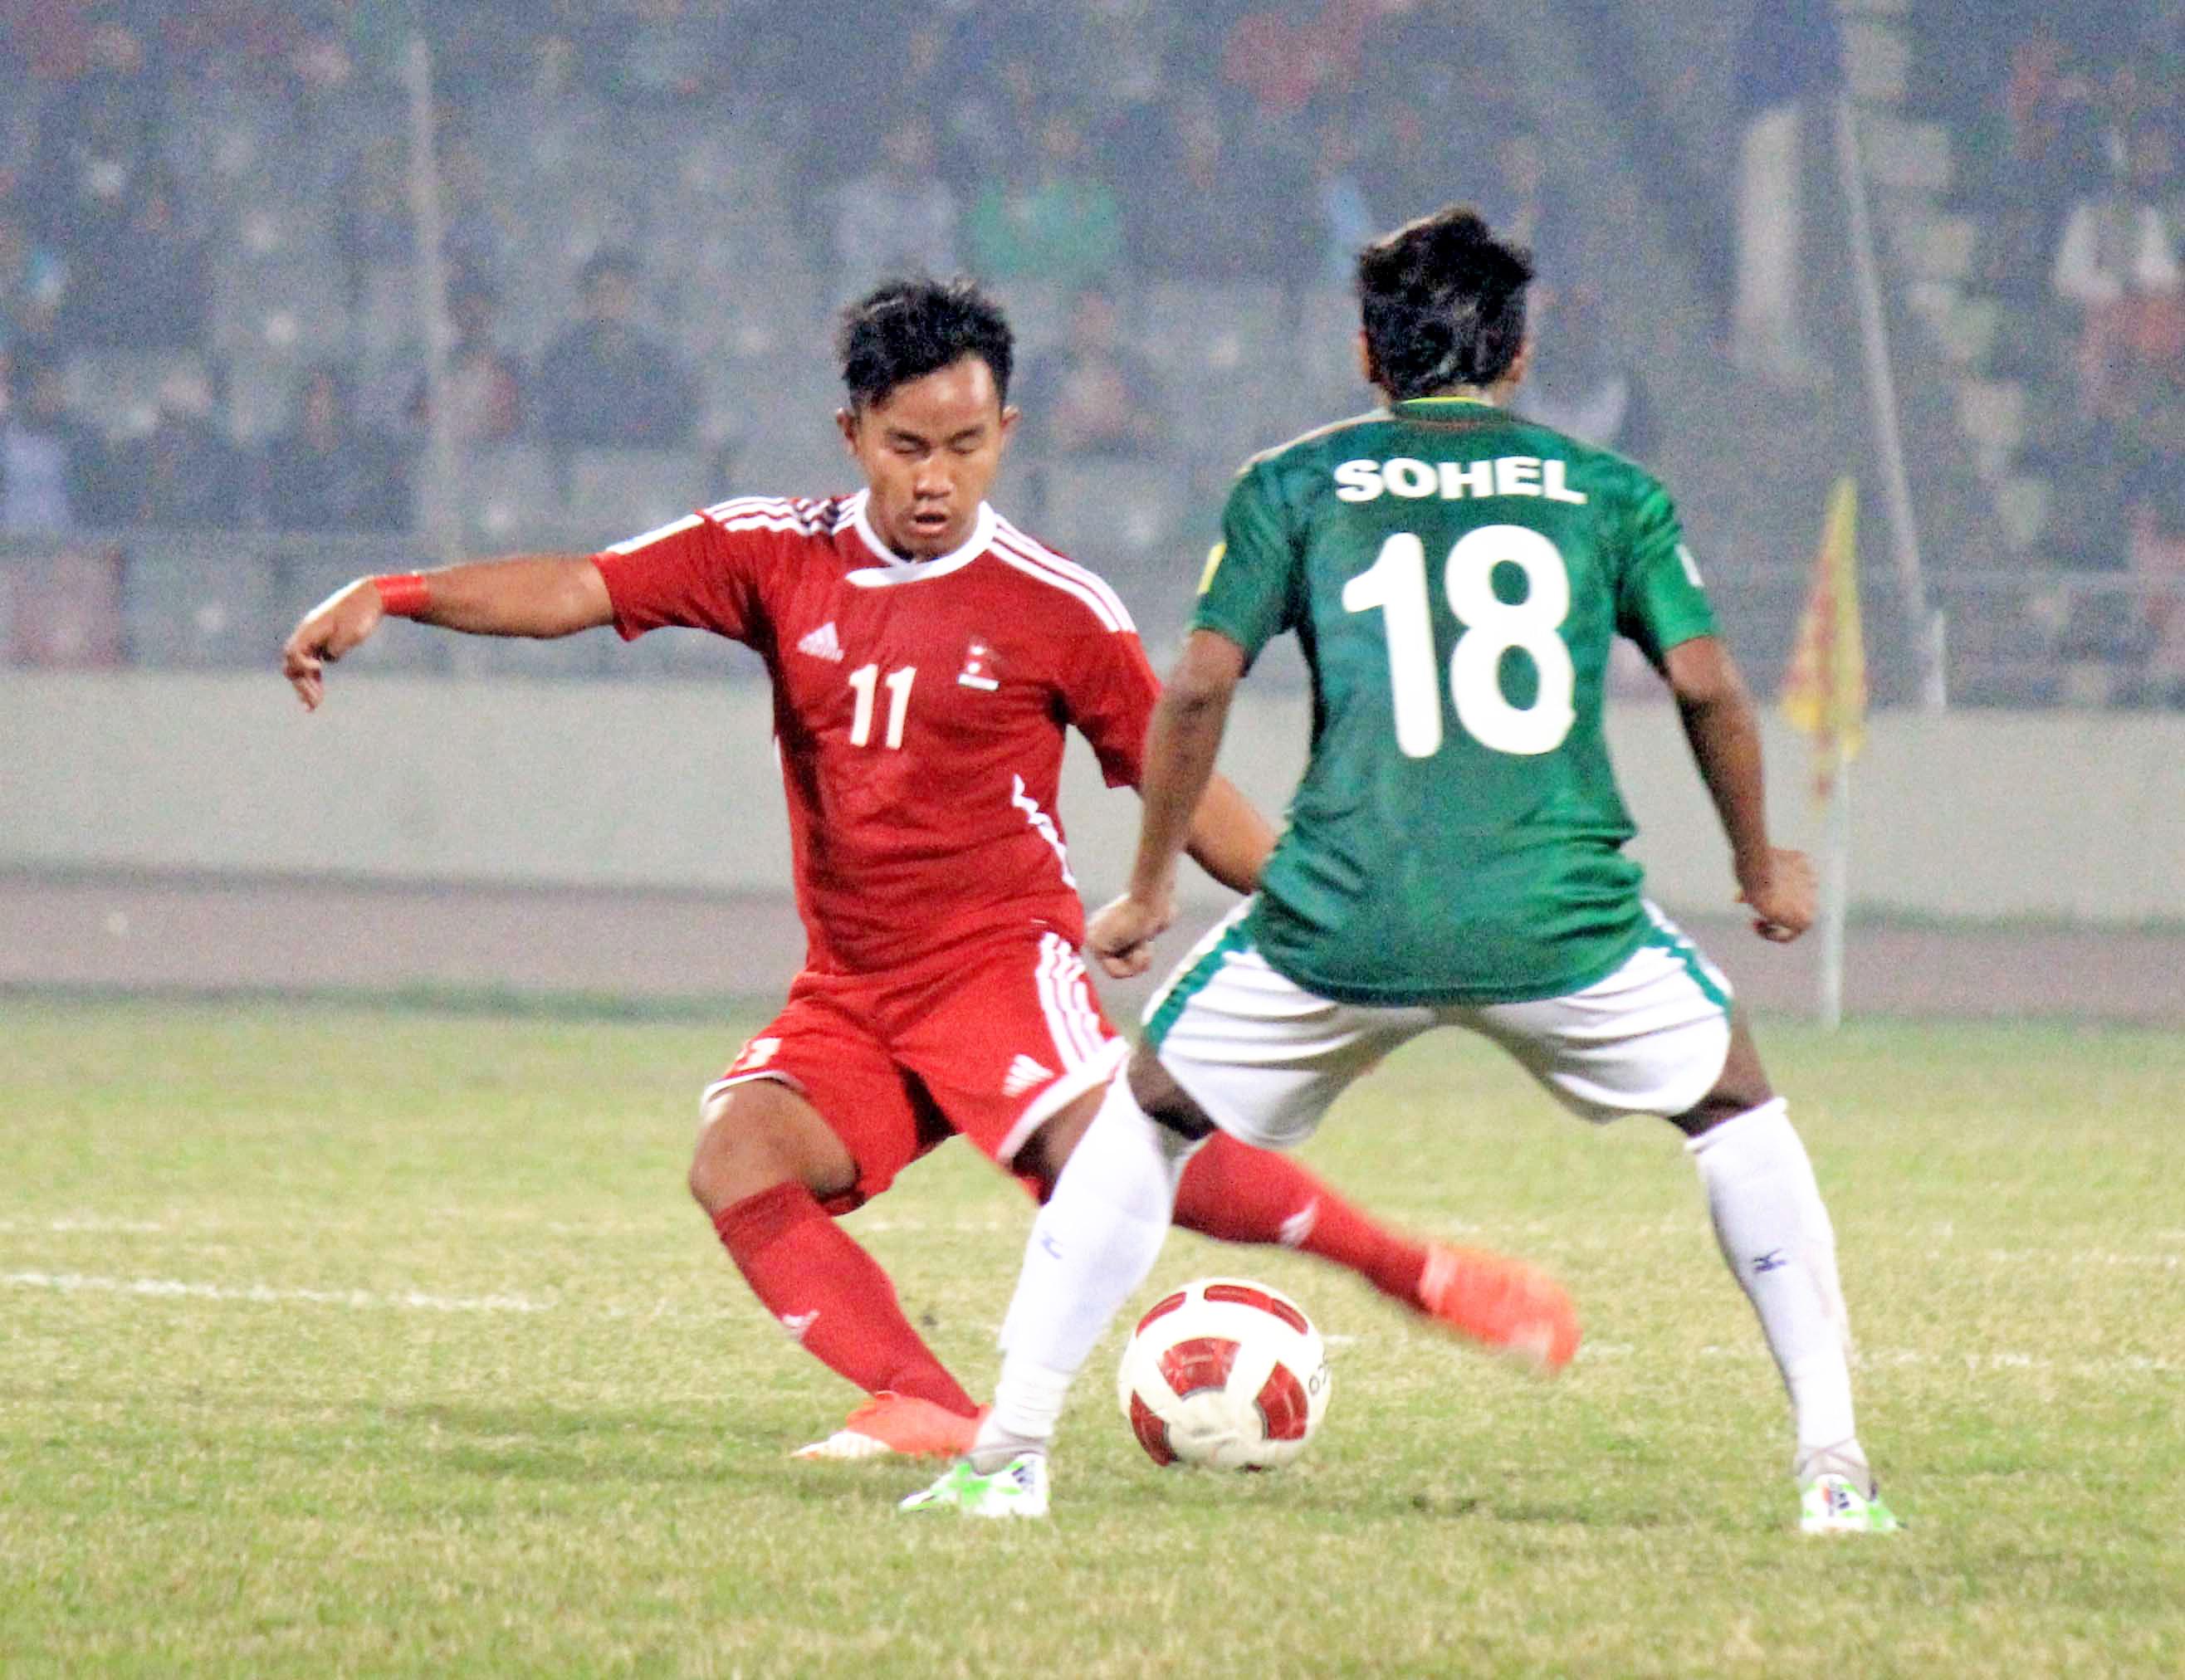 FILE: Nepali player tries to dribble past a Bangladeshi player during their international friendly match at the Bangabandhu Stadium on Thursday, December 17, 2015. Photo: ANFA